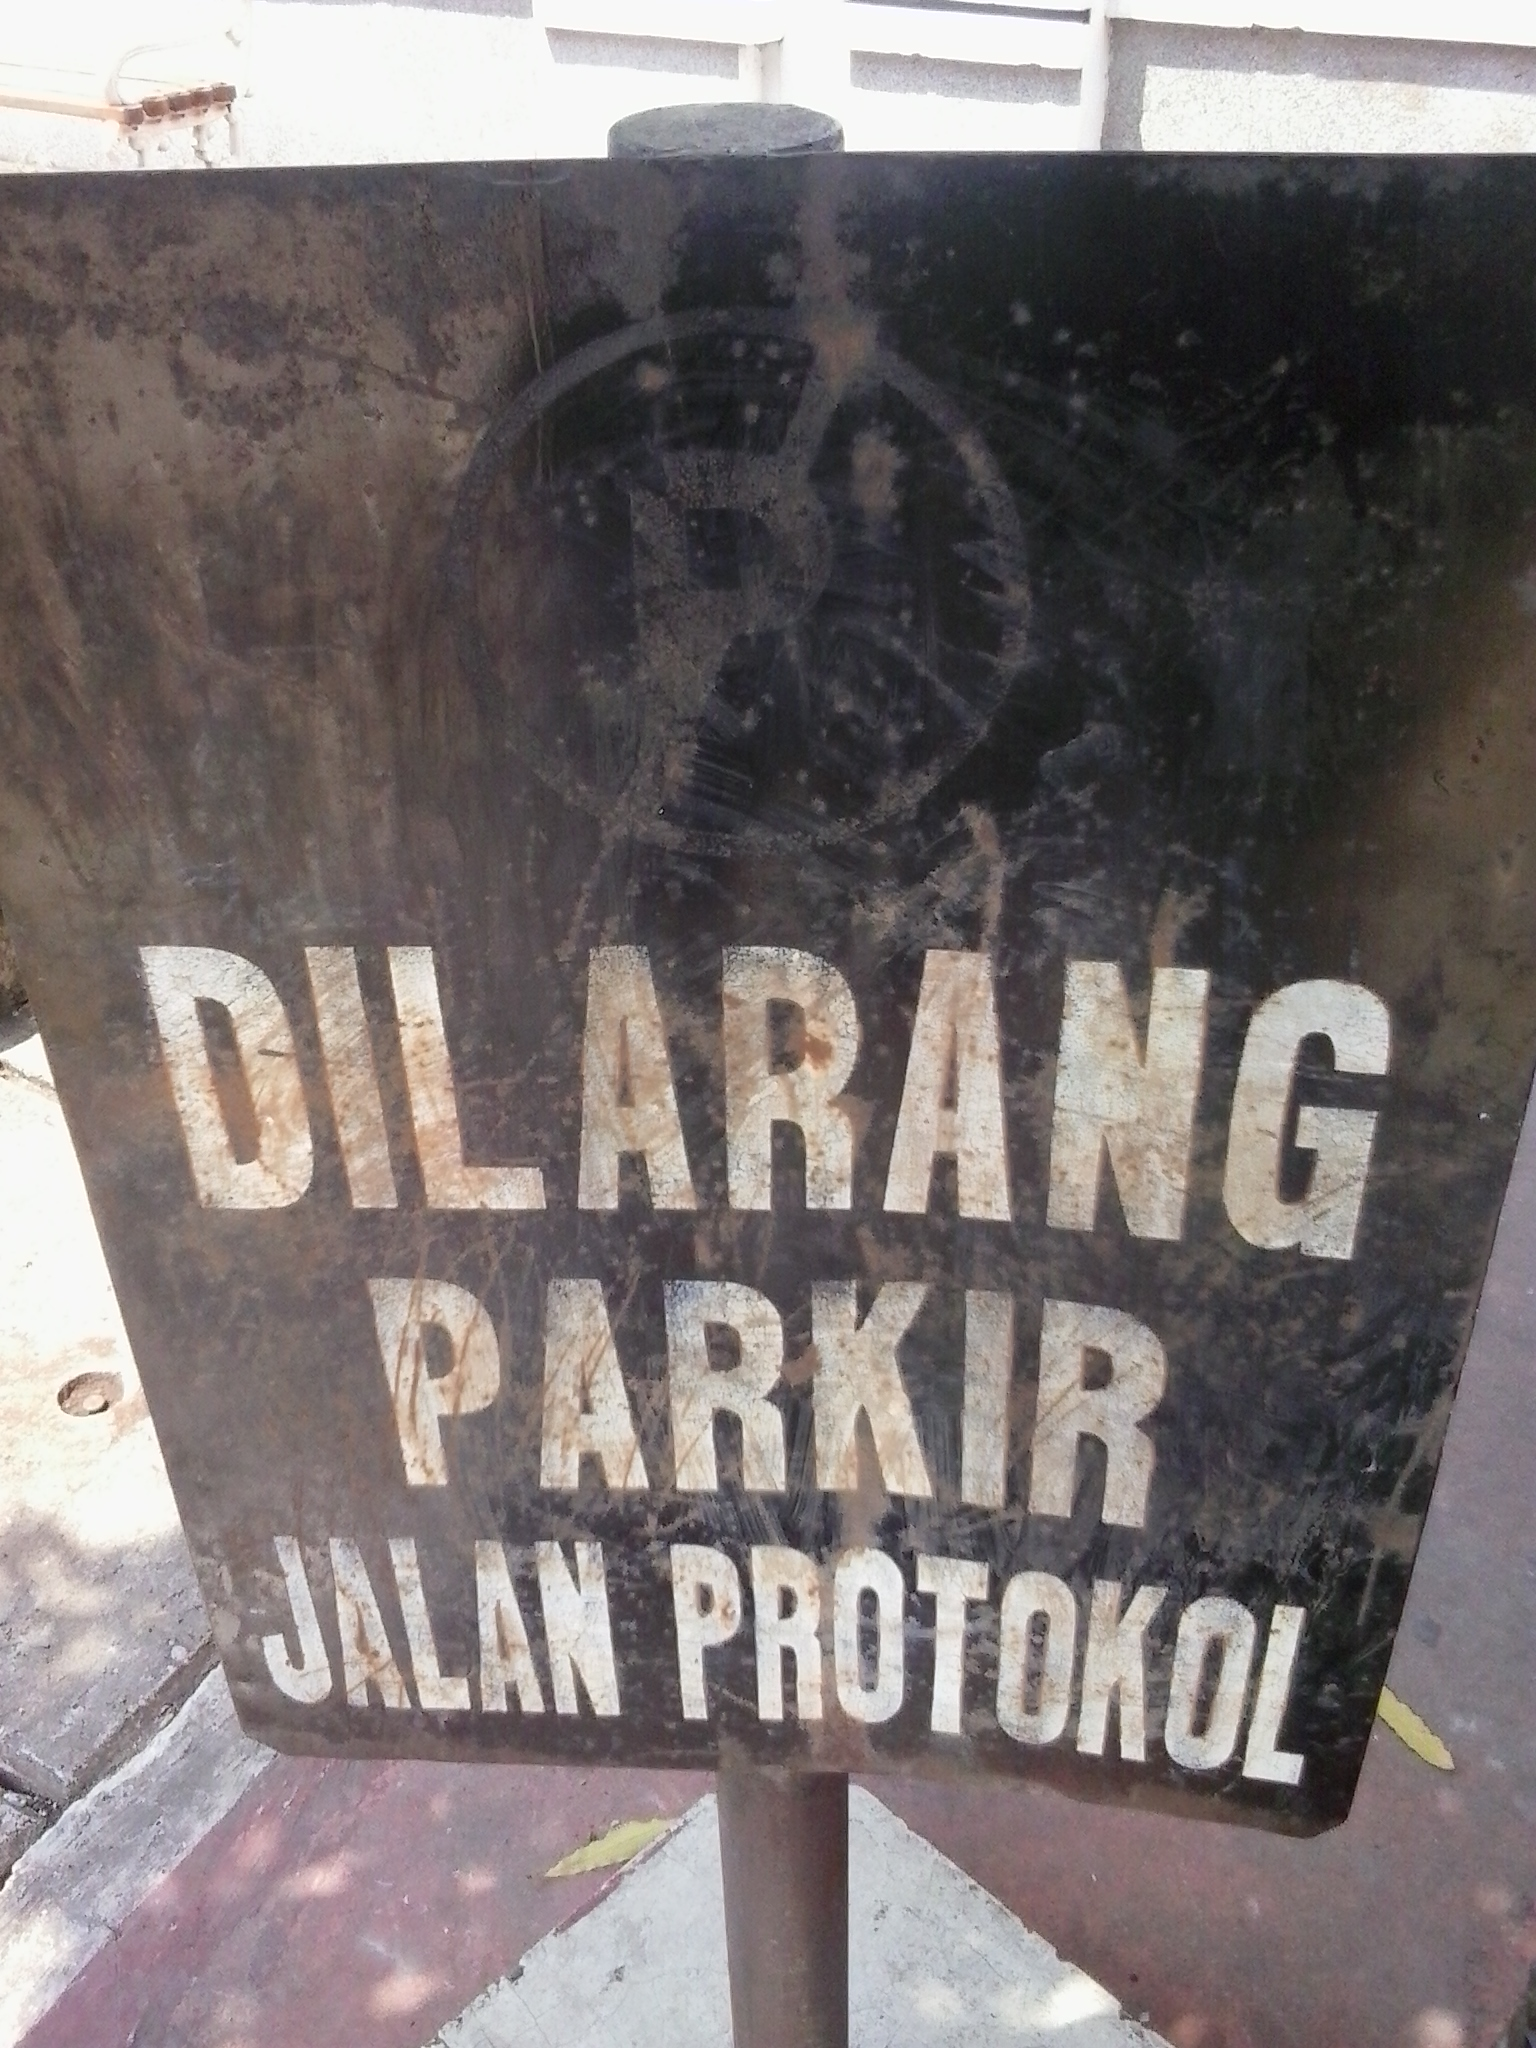 Rambu parkir - Wikipedia bahasa Indonesia, ensiklopedia bebas